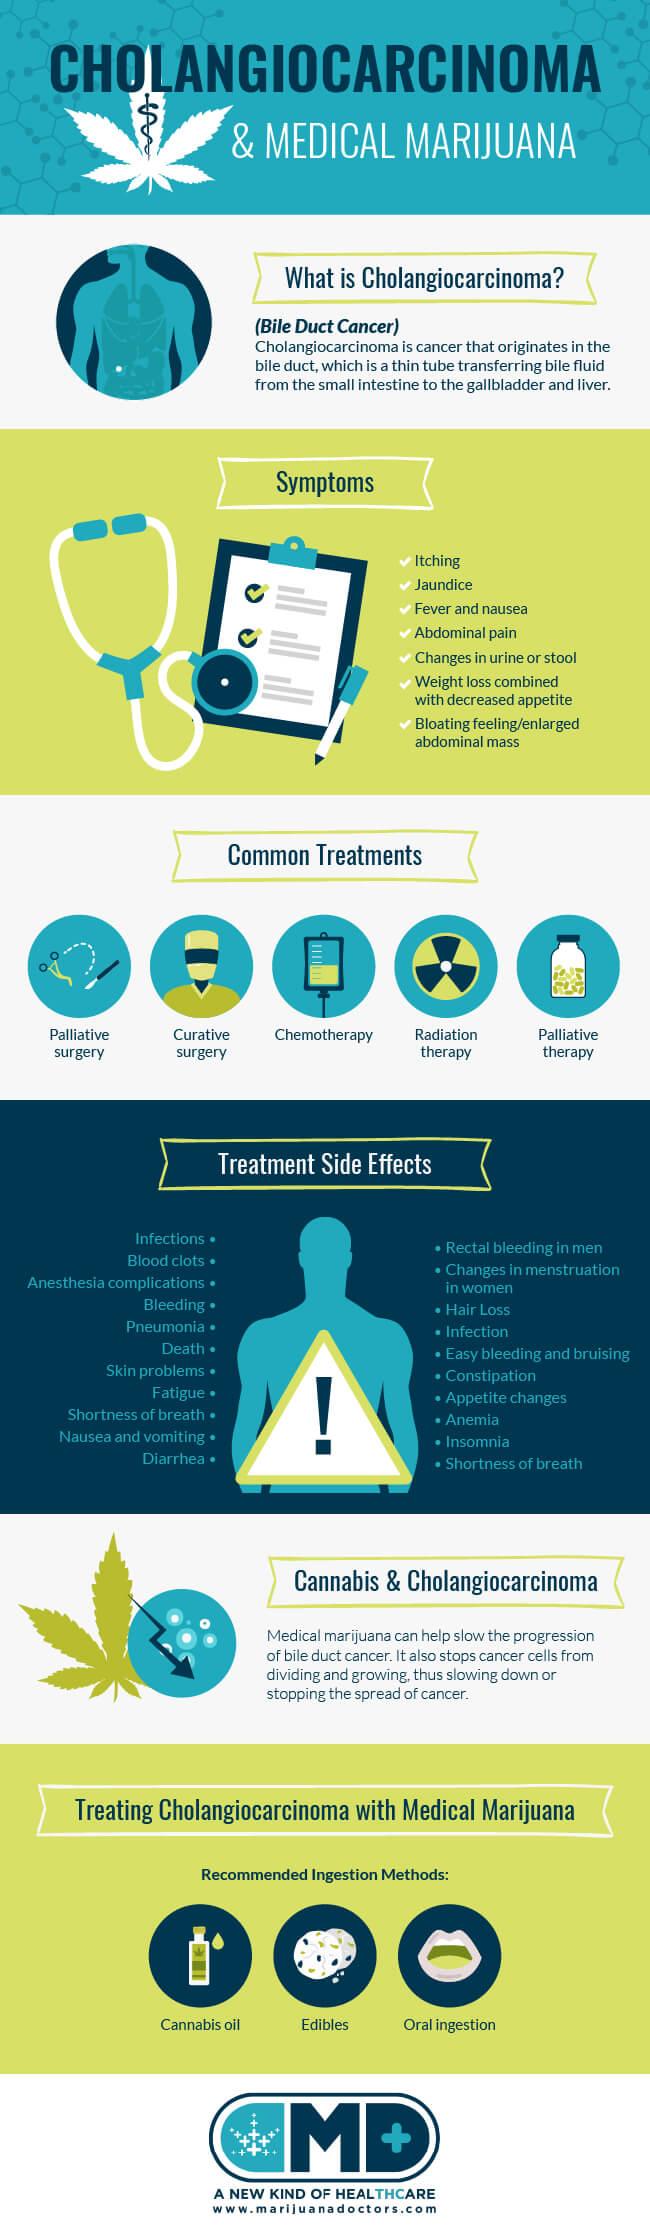 Medical Marijuana & Bile Duct Cancer